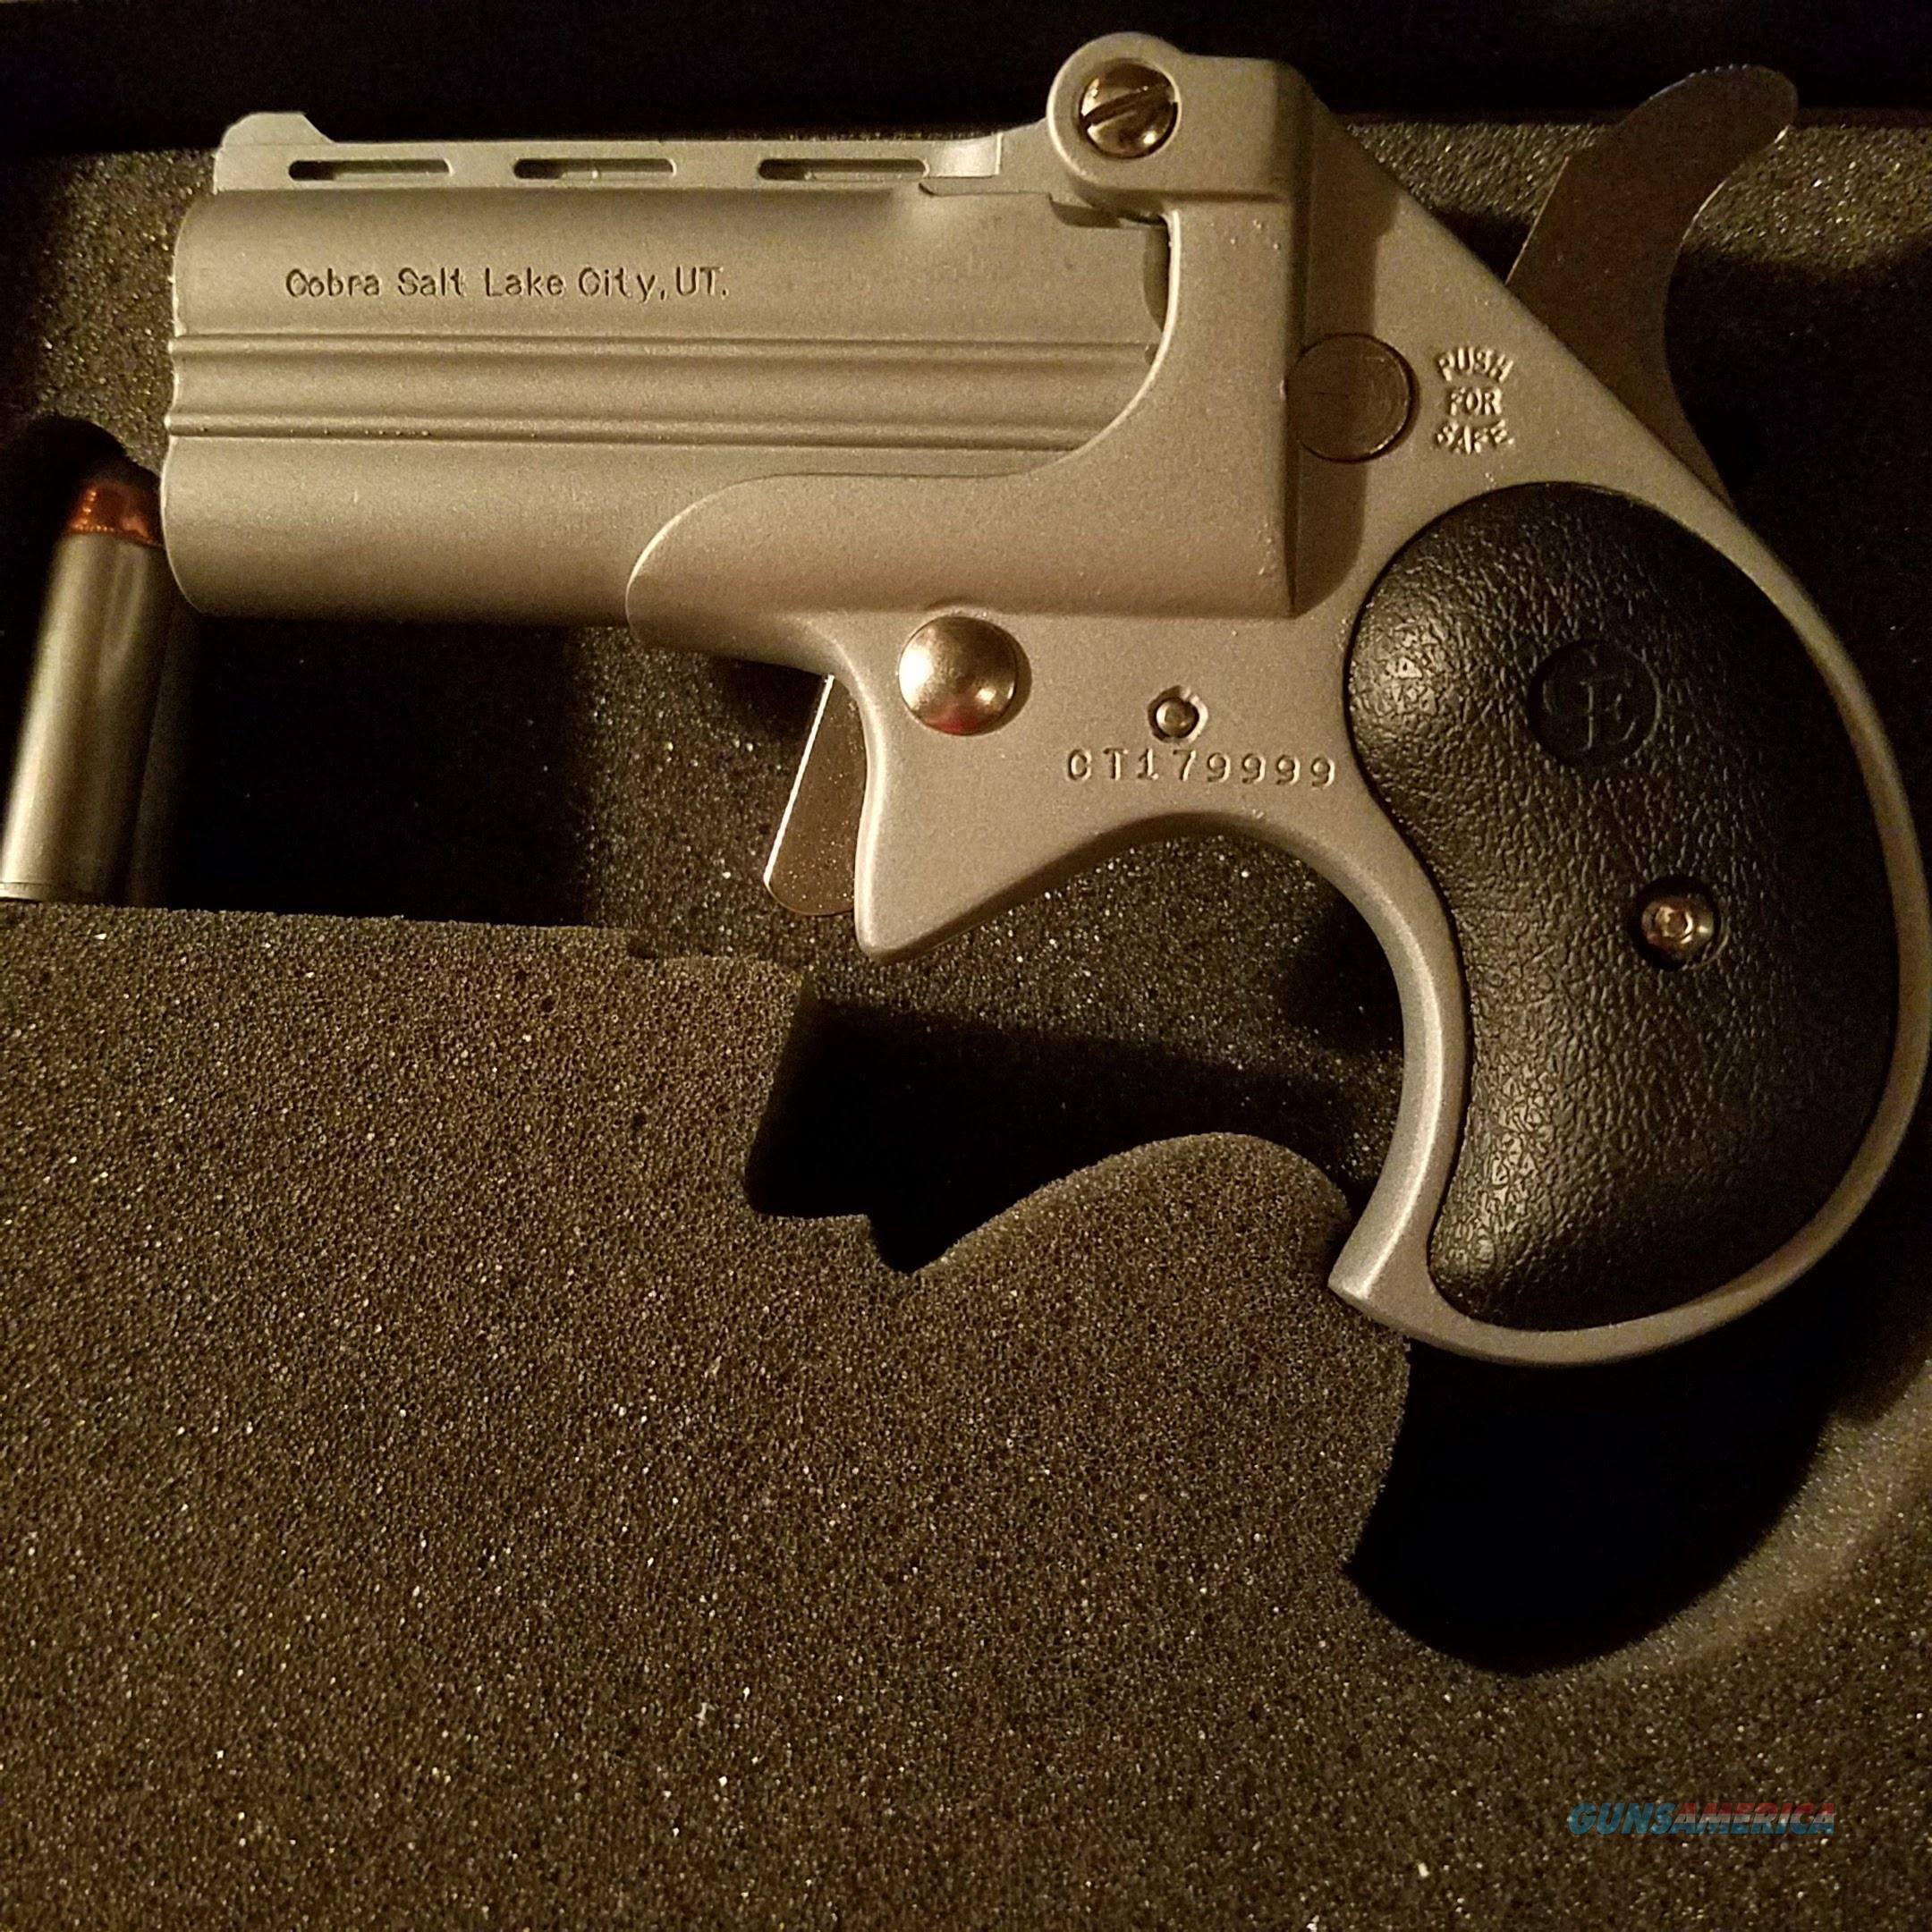 cobra derringer 38 special cb38sb ni for sale rh gunsamerica com Cobra Derringer 22 Mag Cobra Derringer 38 Special Manual